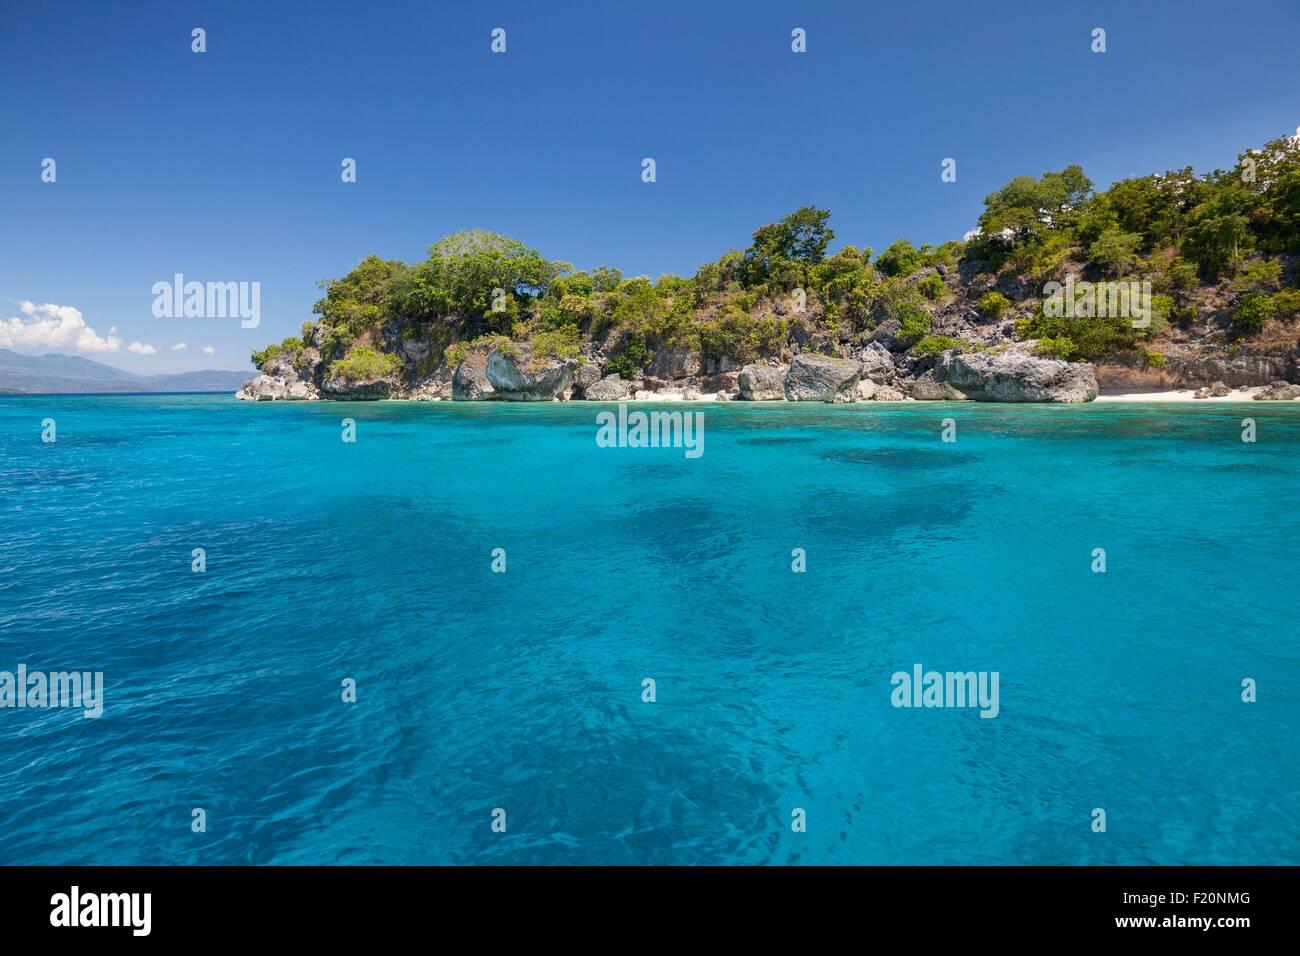 Indonesia, Lesser Sunda Islands, Alor archipelago, Buaya Island - Stock Image